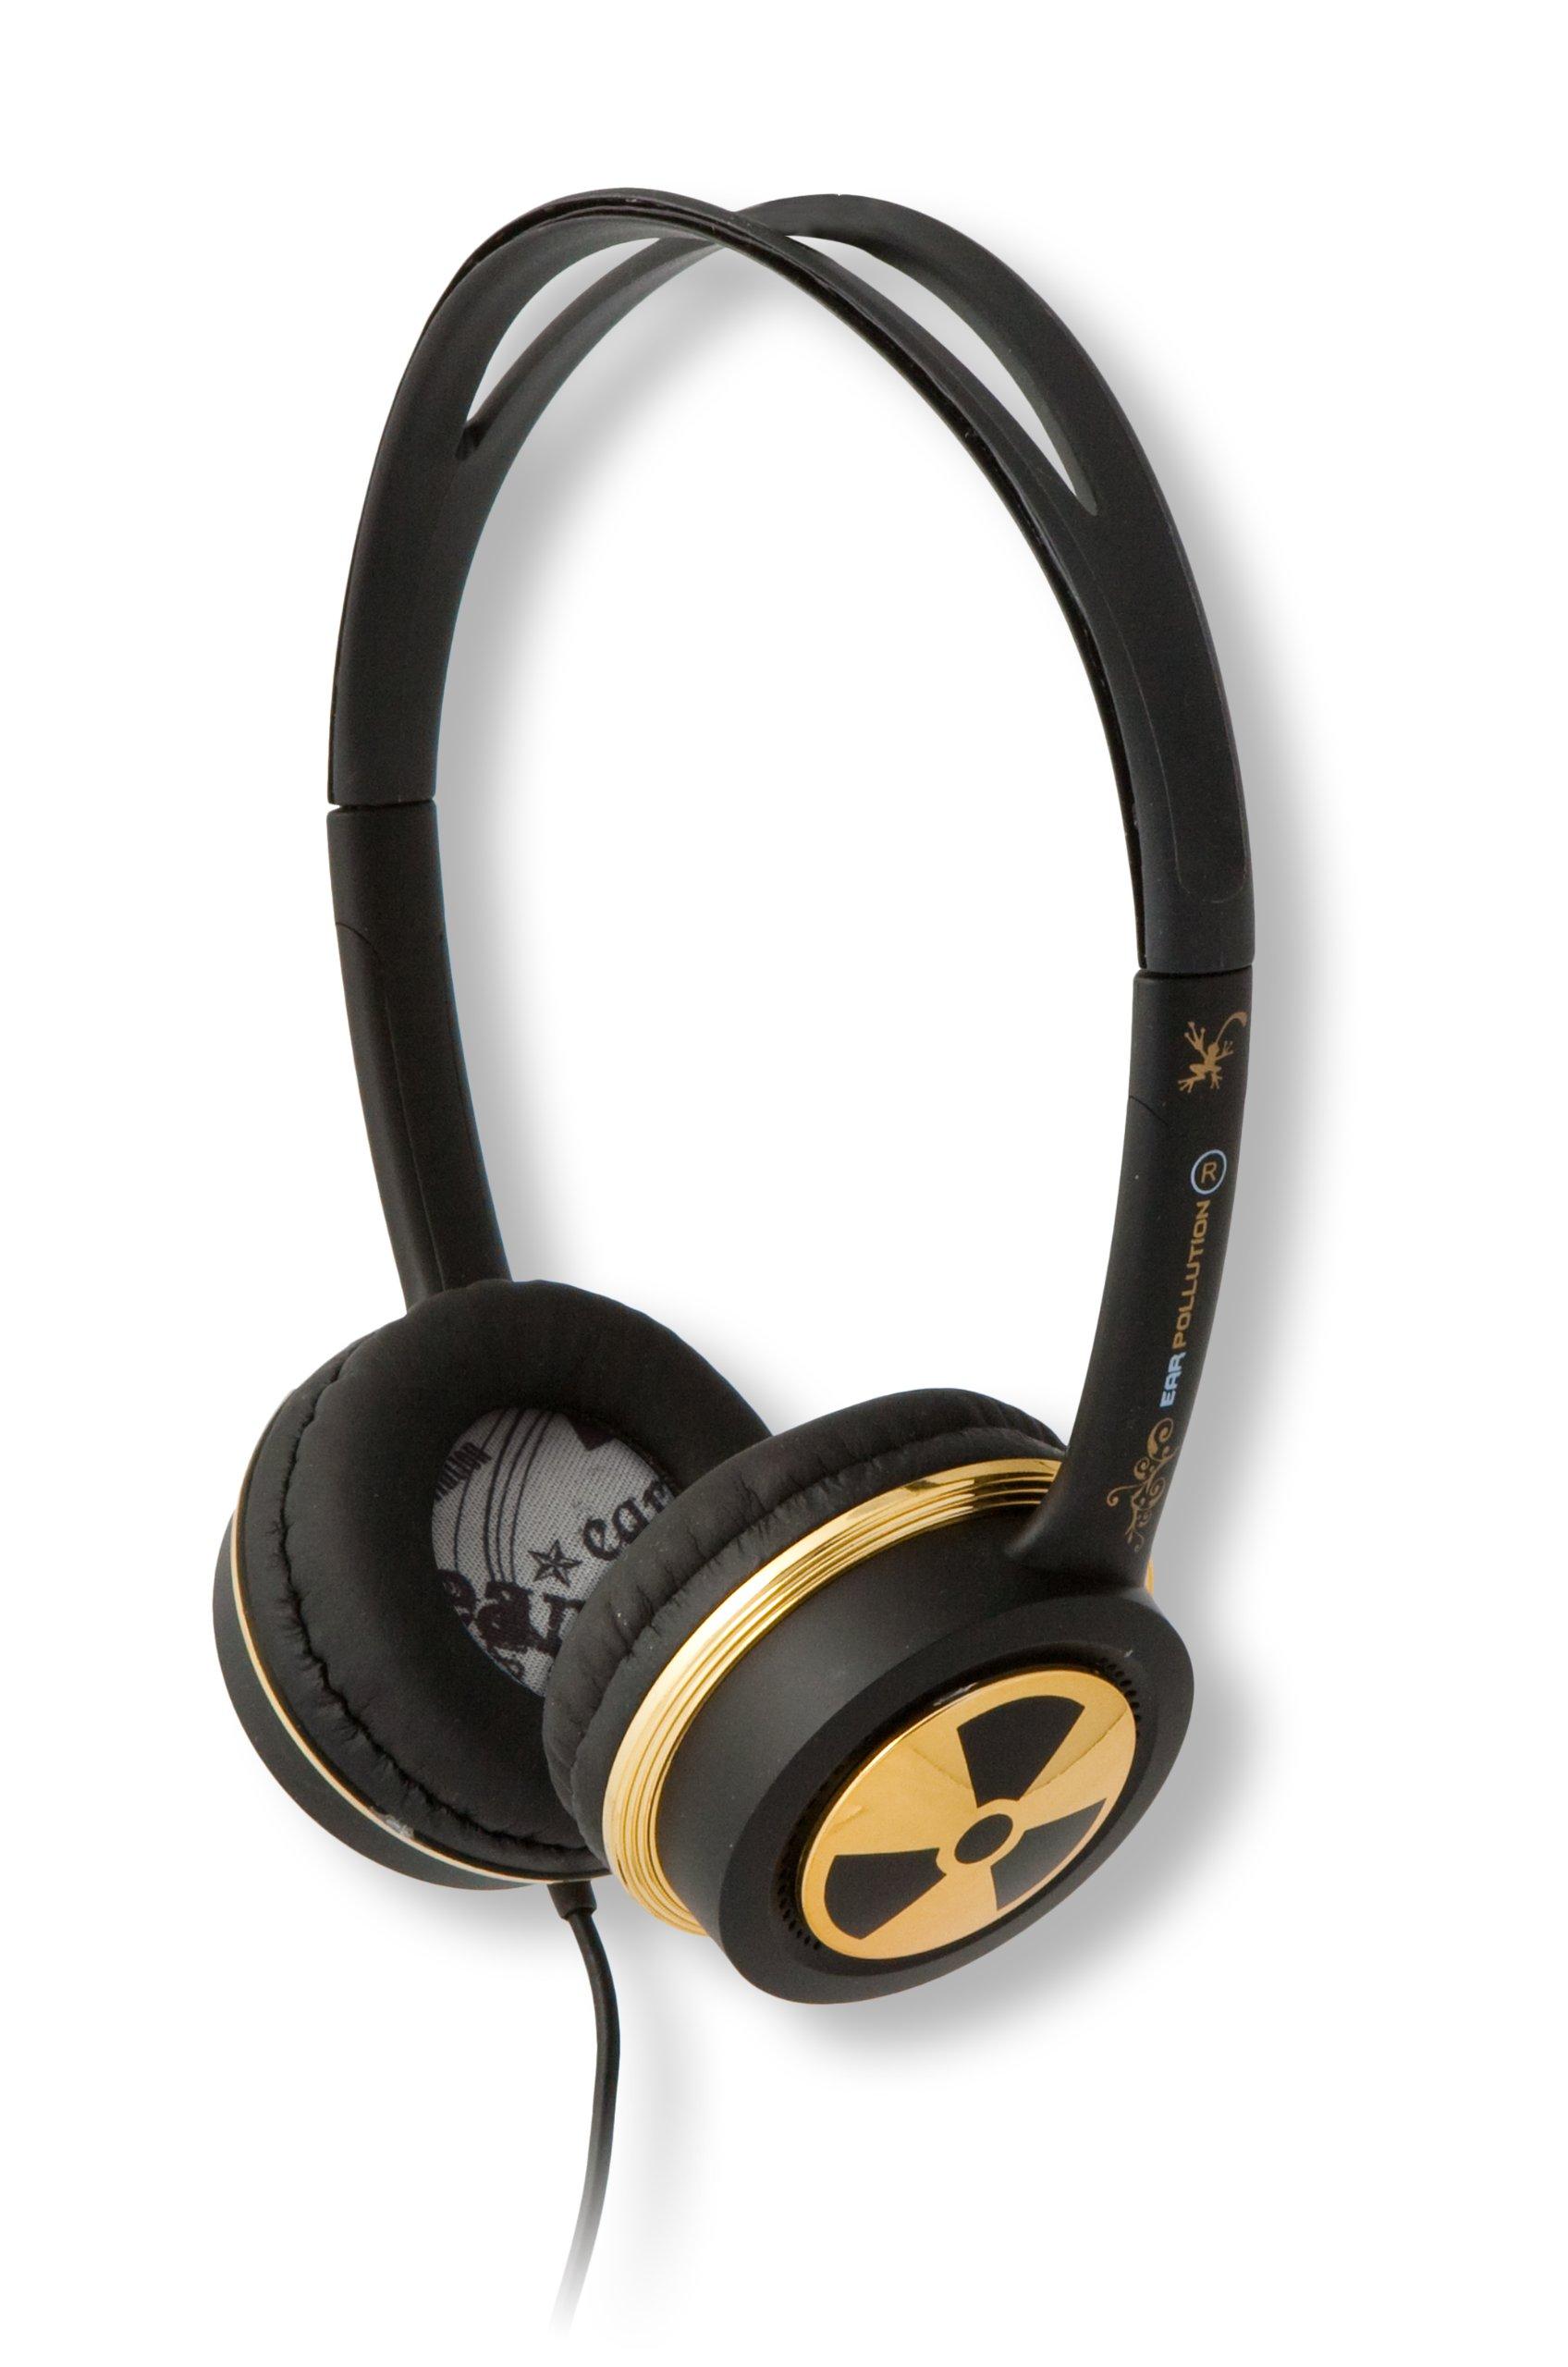 EarPollution Toxix Headphones - Gold (EP-TX-GOLD)